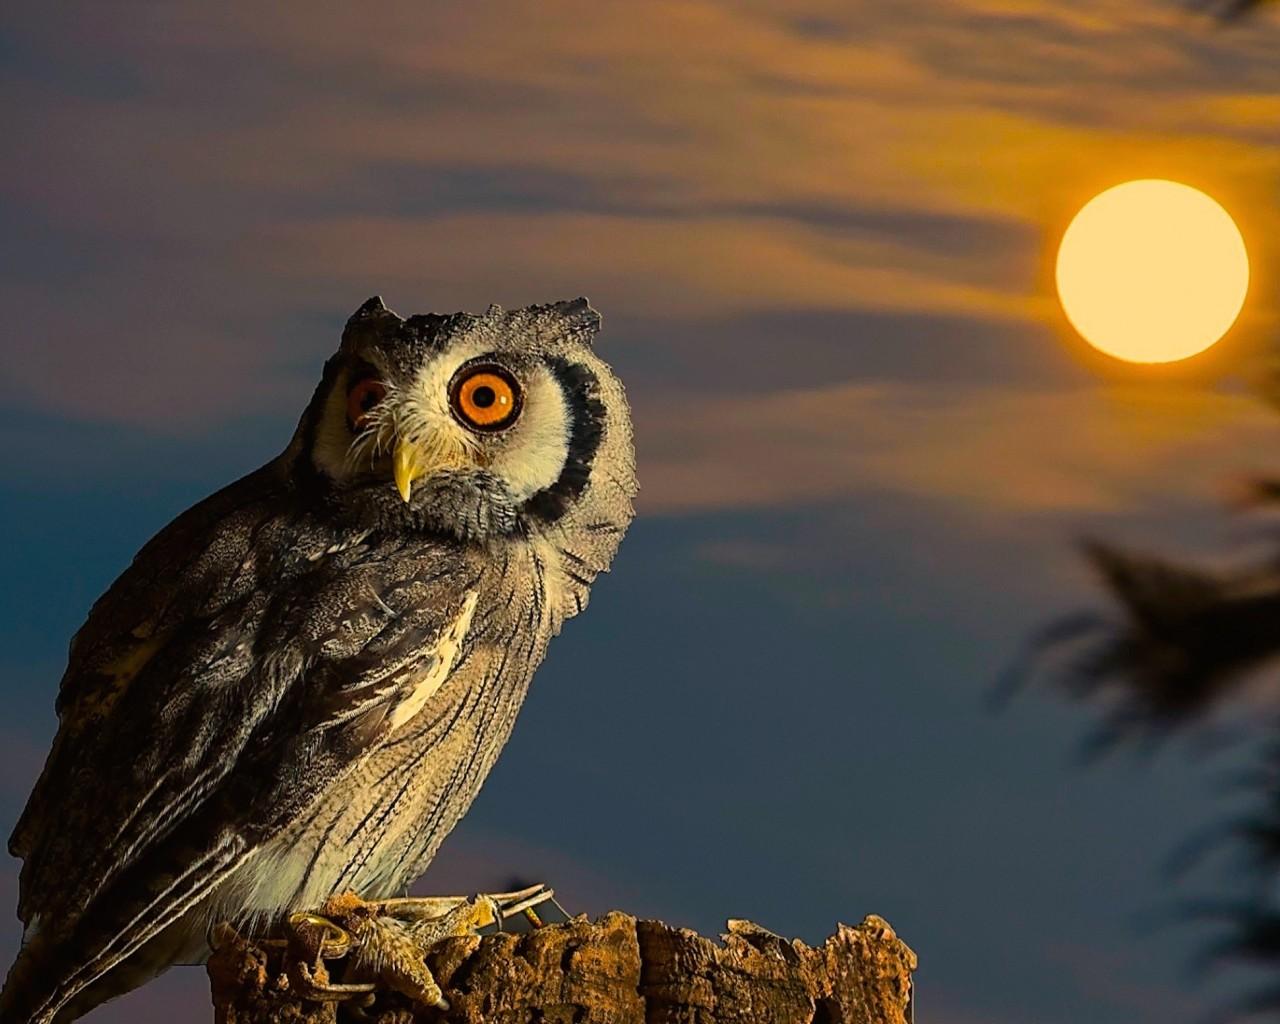 Katrina Kaif 3d Wallpaper Owl Full Moon Hd Wallpaper Free Hd Owl Downloads